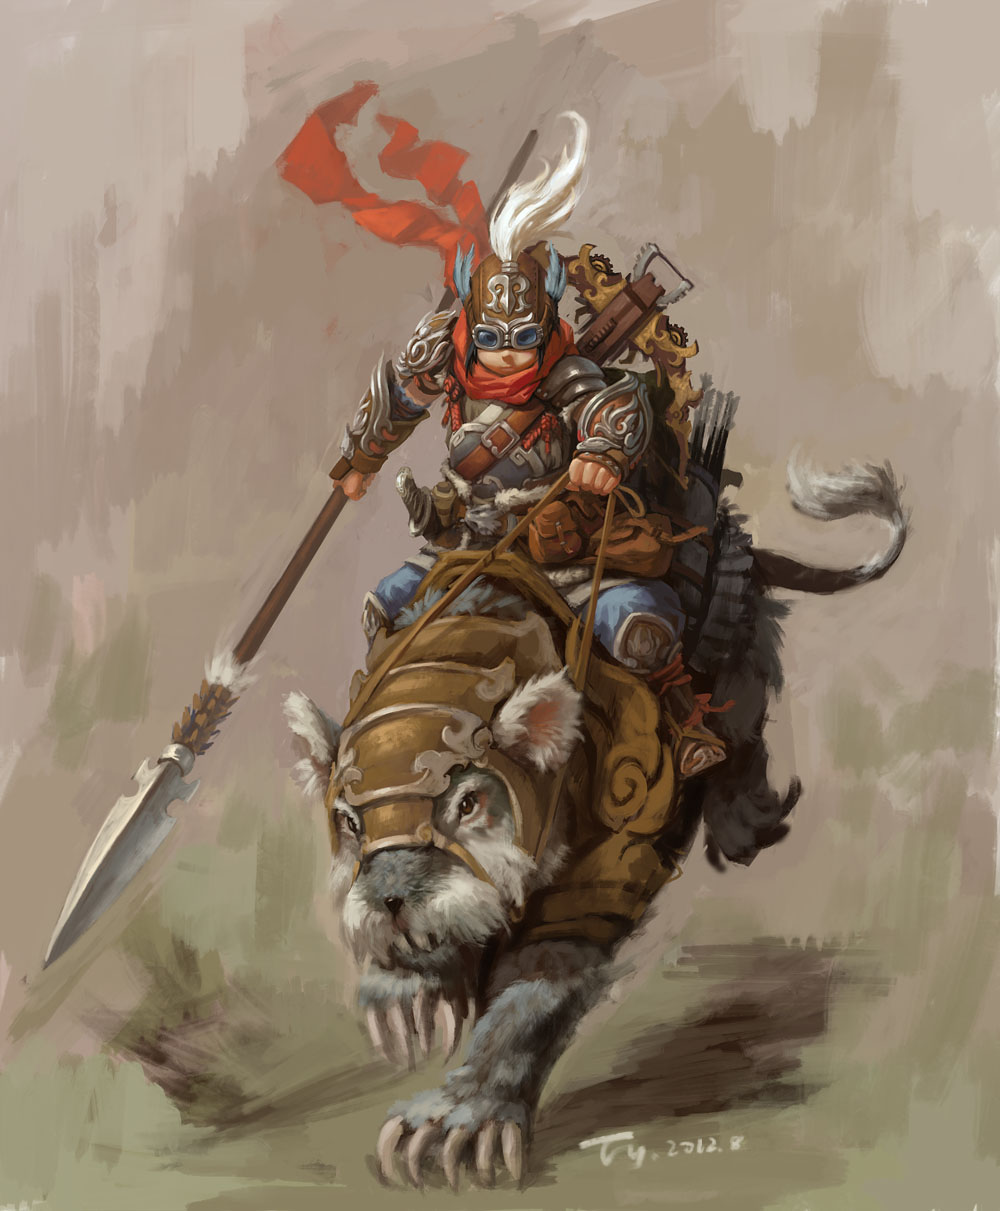 Giant Rat Cavalry By Tayo750988 On Deviantart